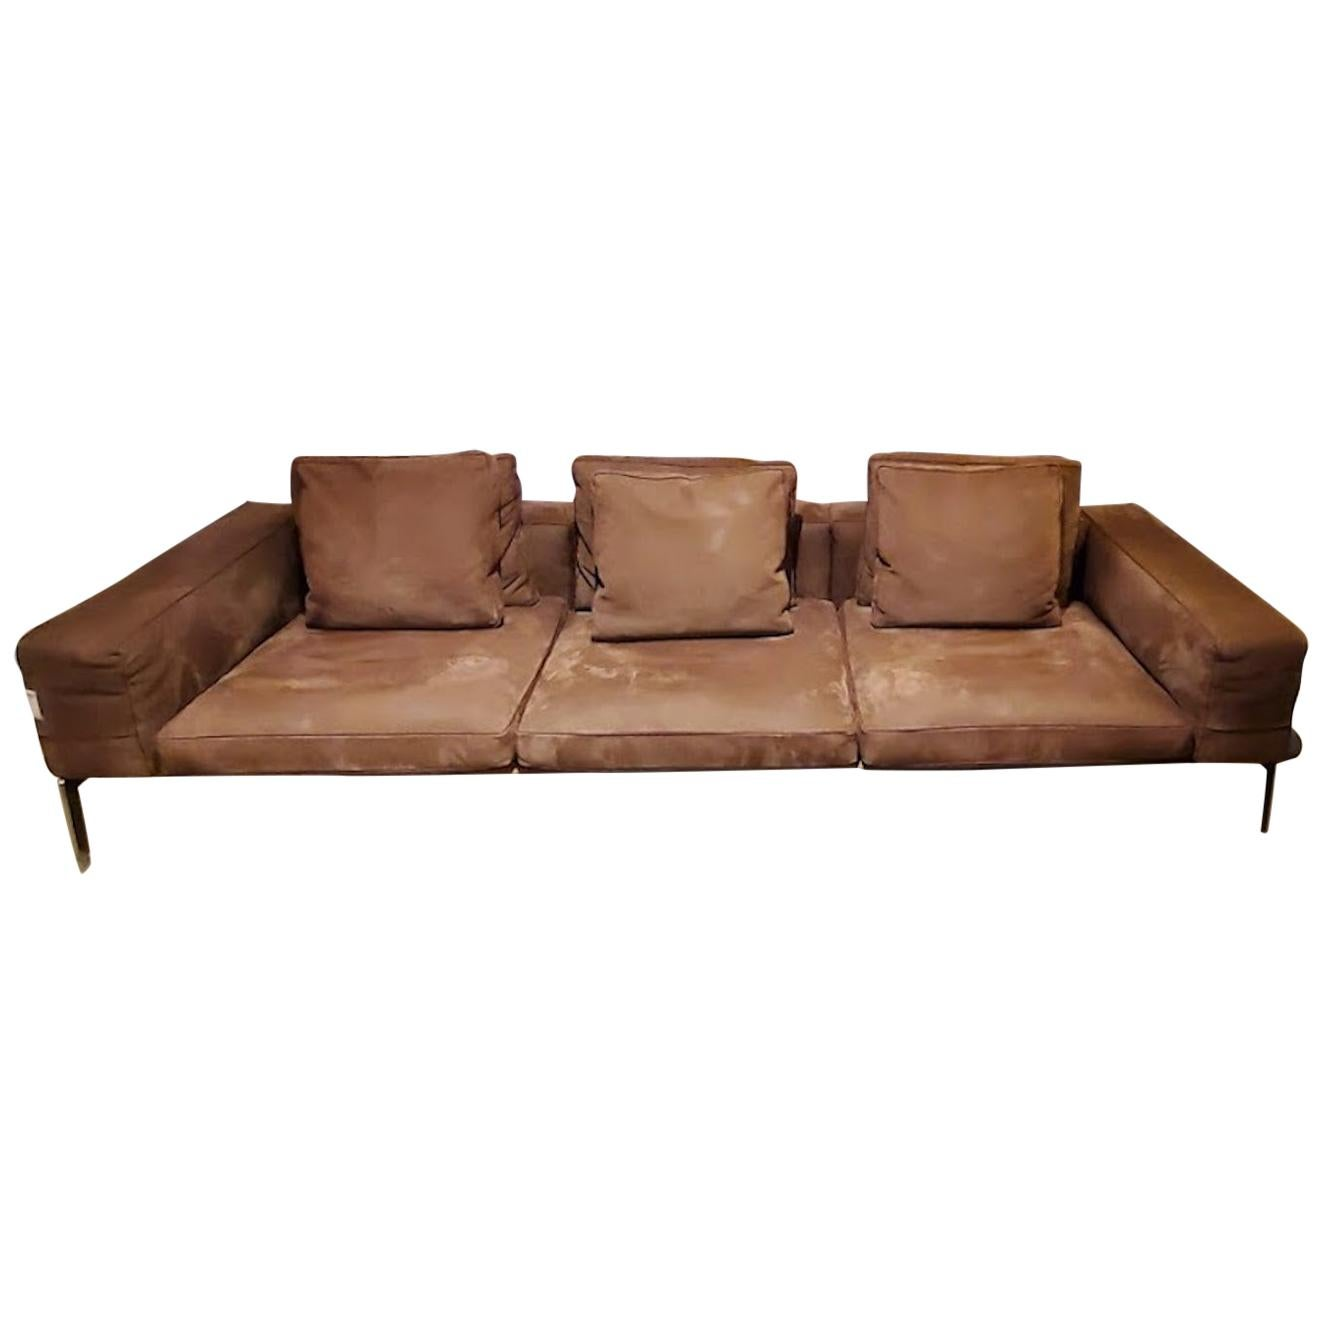 Lifesteel Brown Leather Sofa, by Antonio Citterio from Flexform